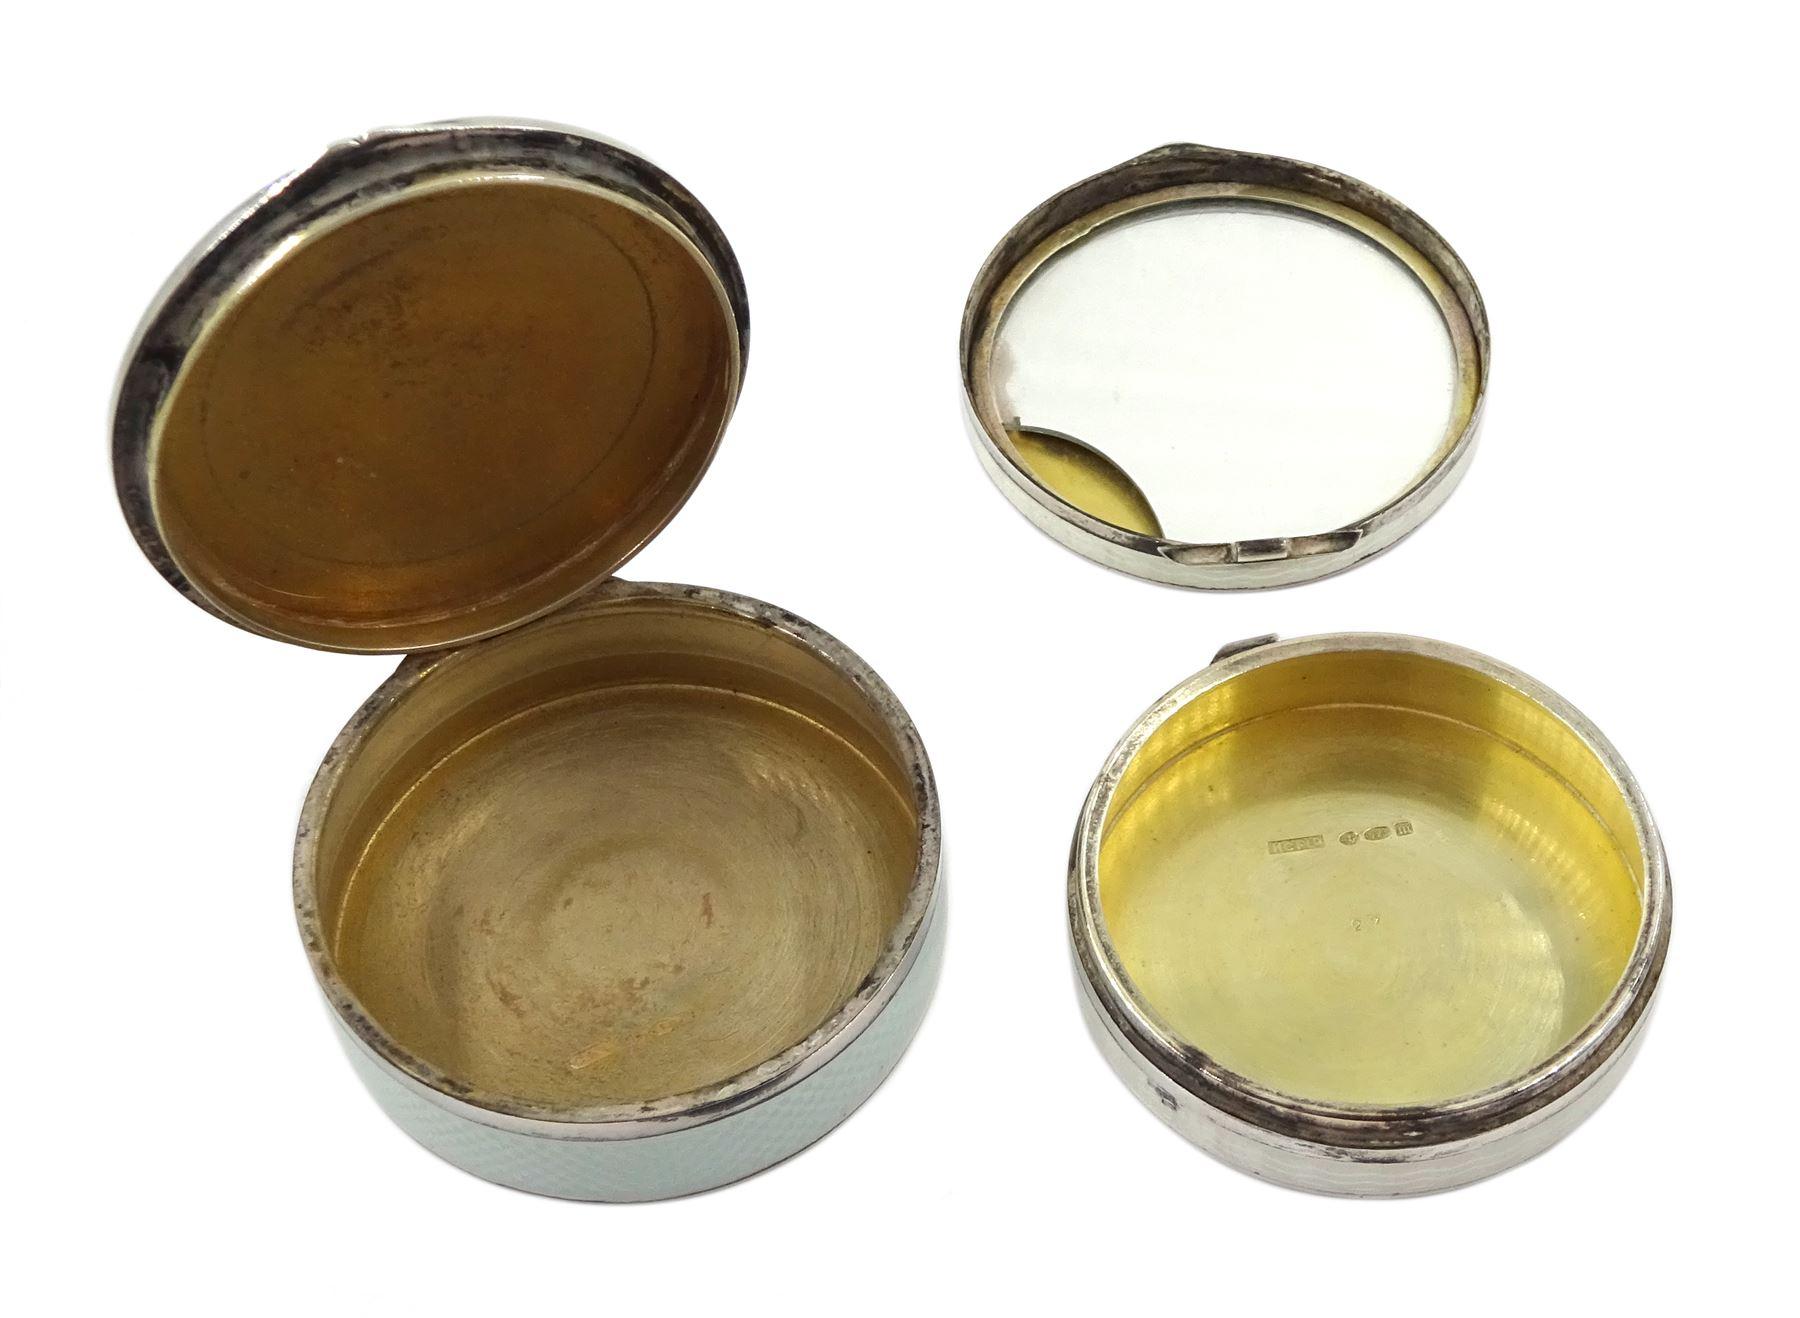 Silver enamel circular compact - Image 4 of 4